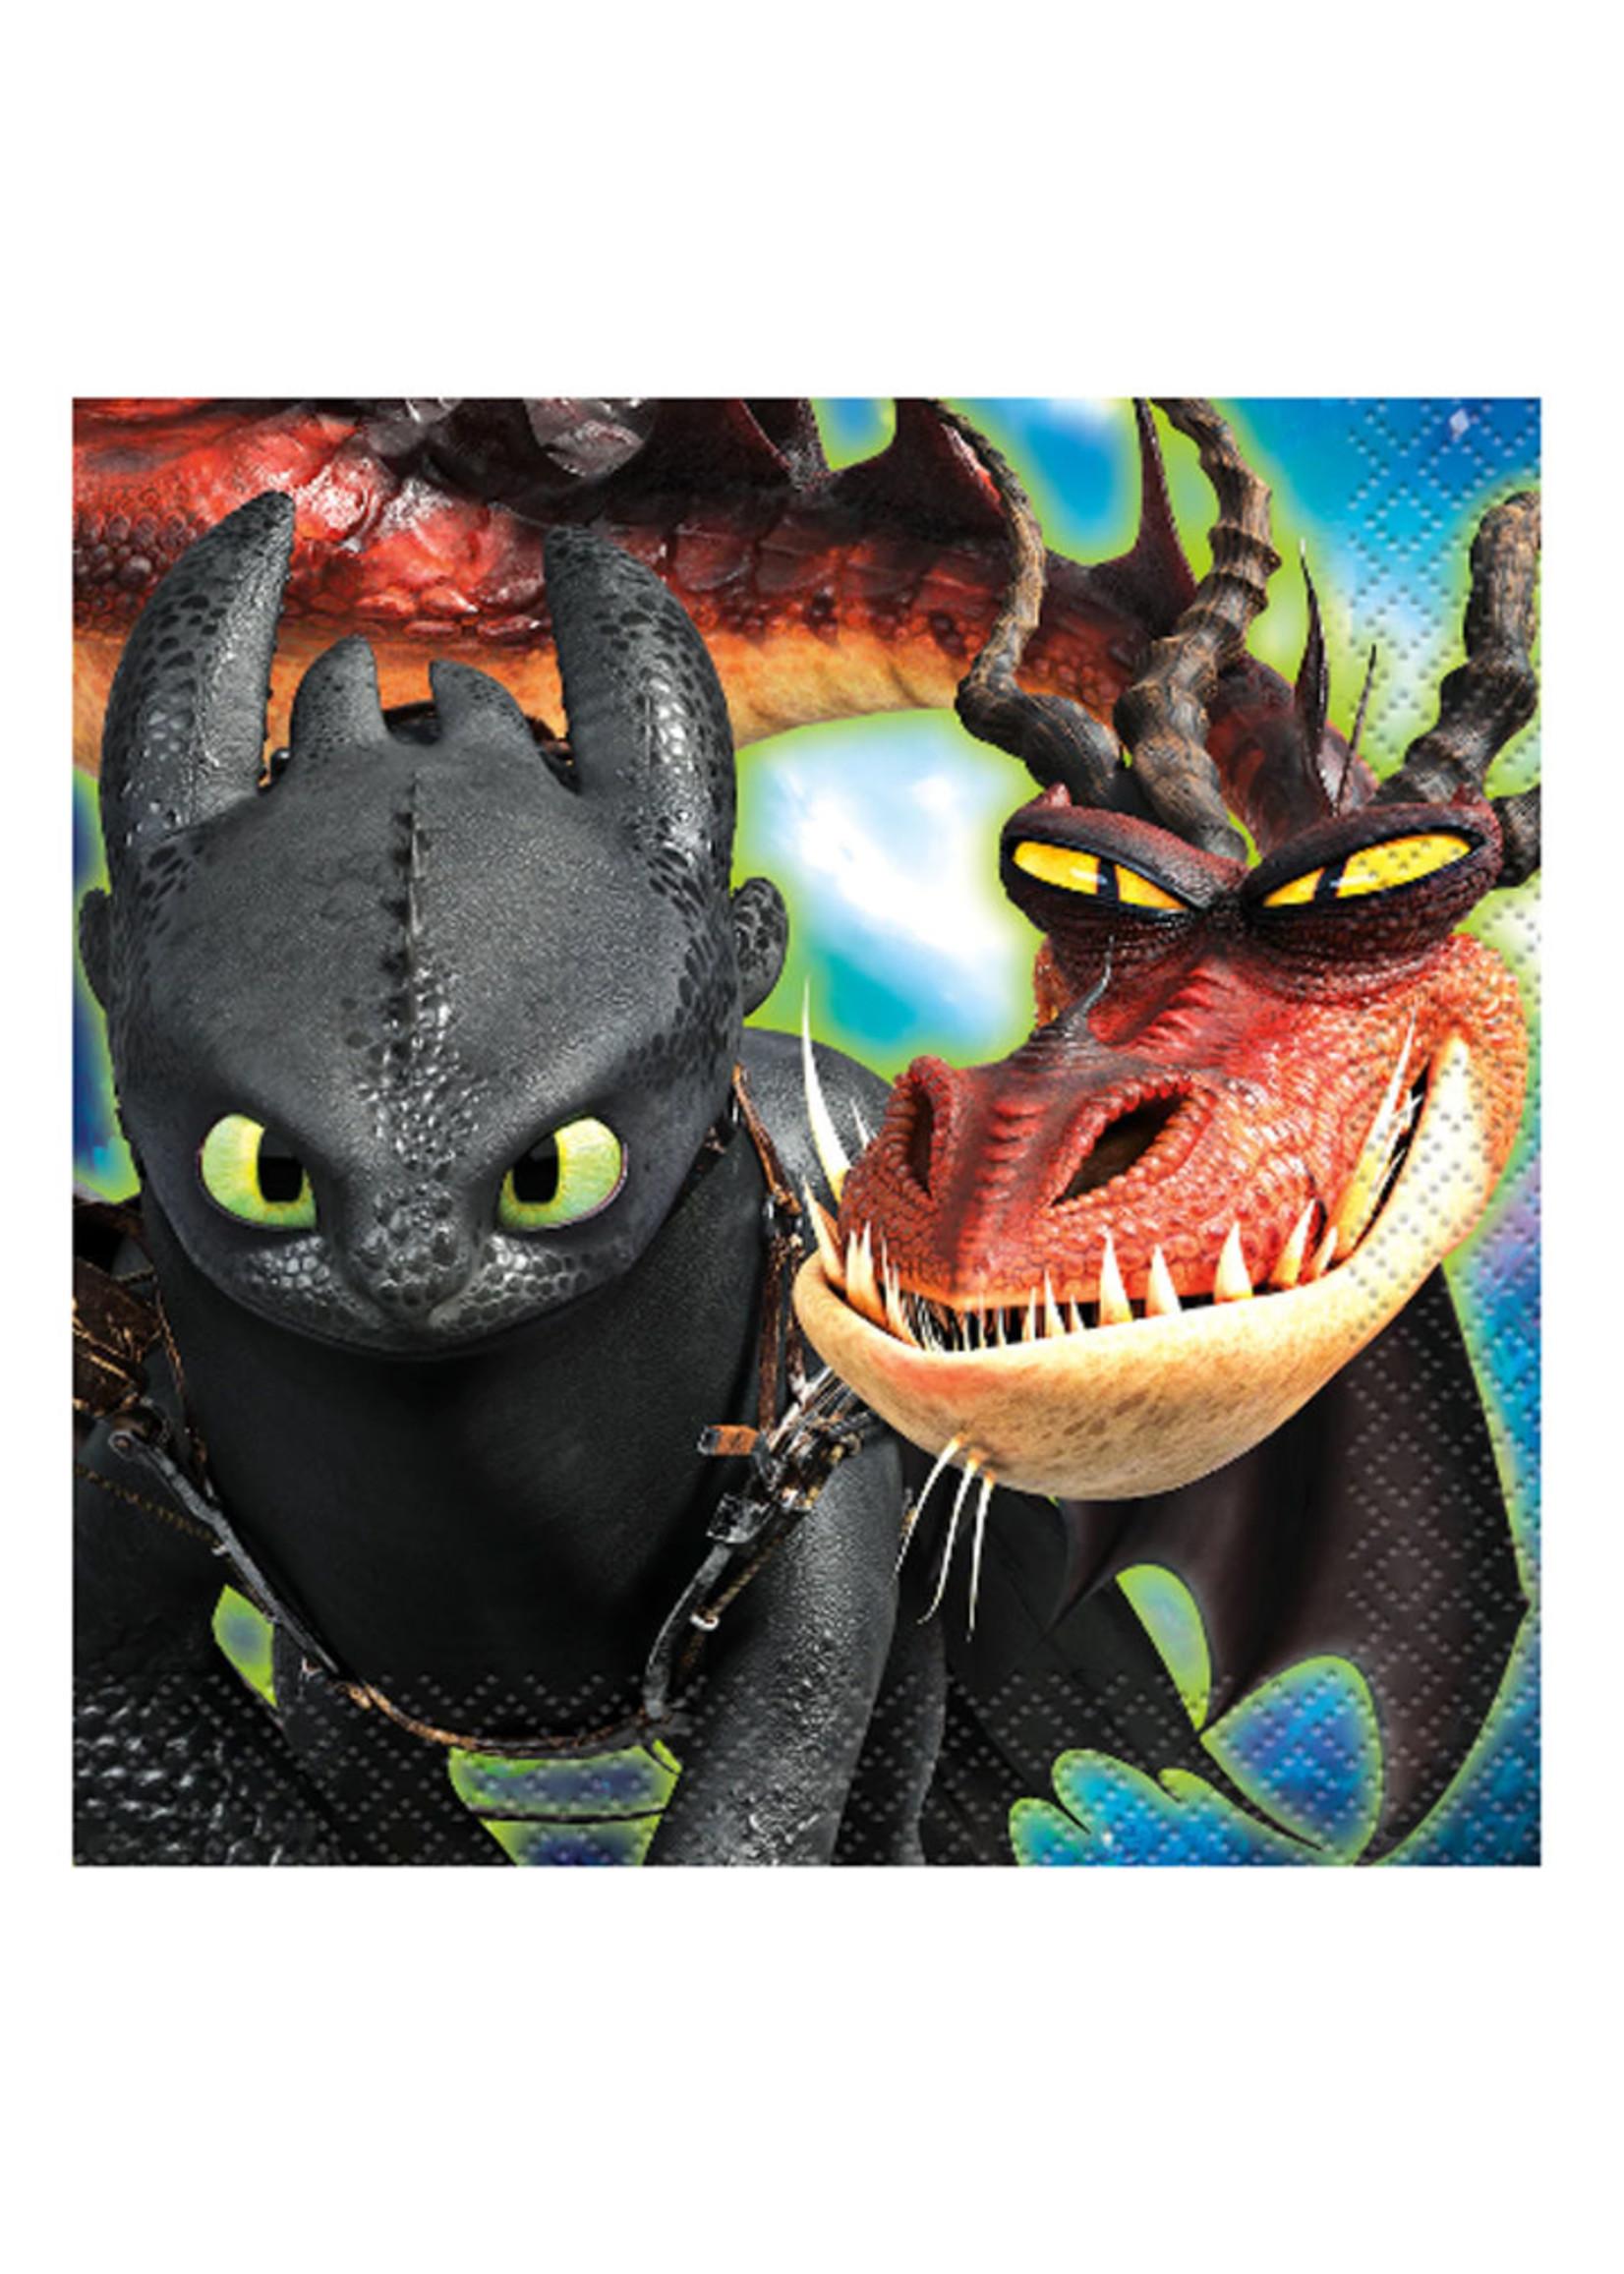 UNIQUE INDUSTRIES INC How to Train Your Dragon Beverage Napkins - 16ct